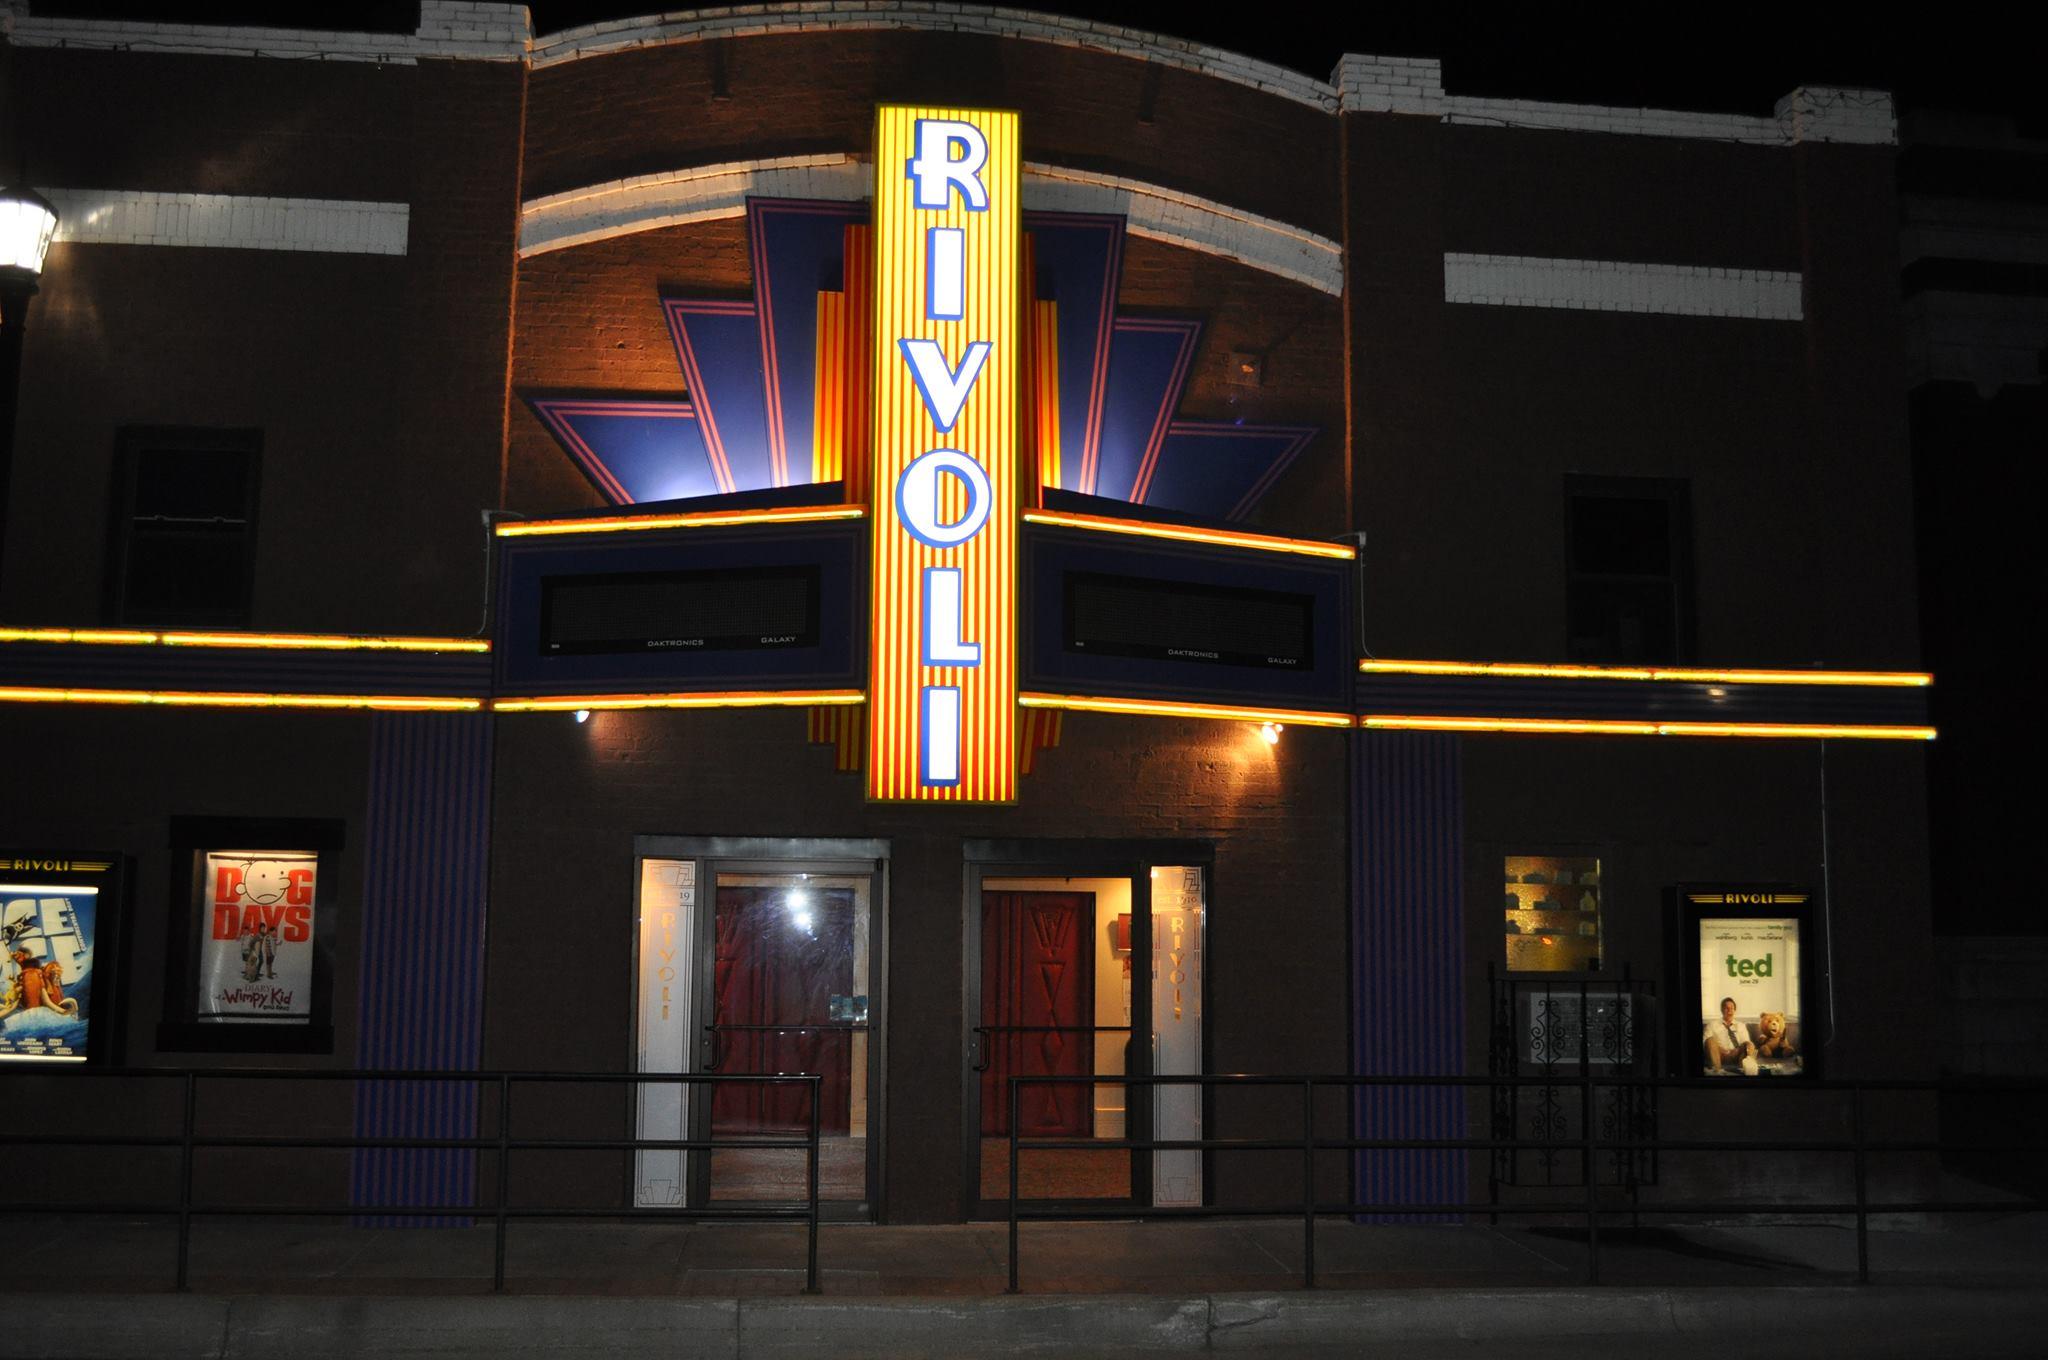 Rivoli Theatre - Seward, NE